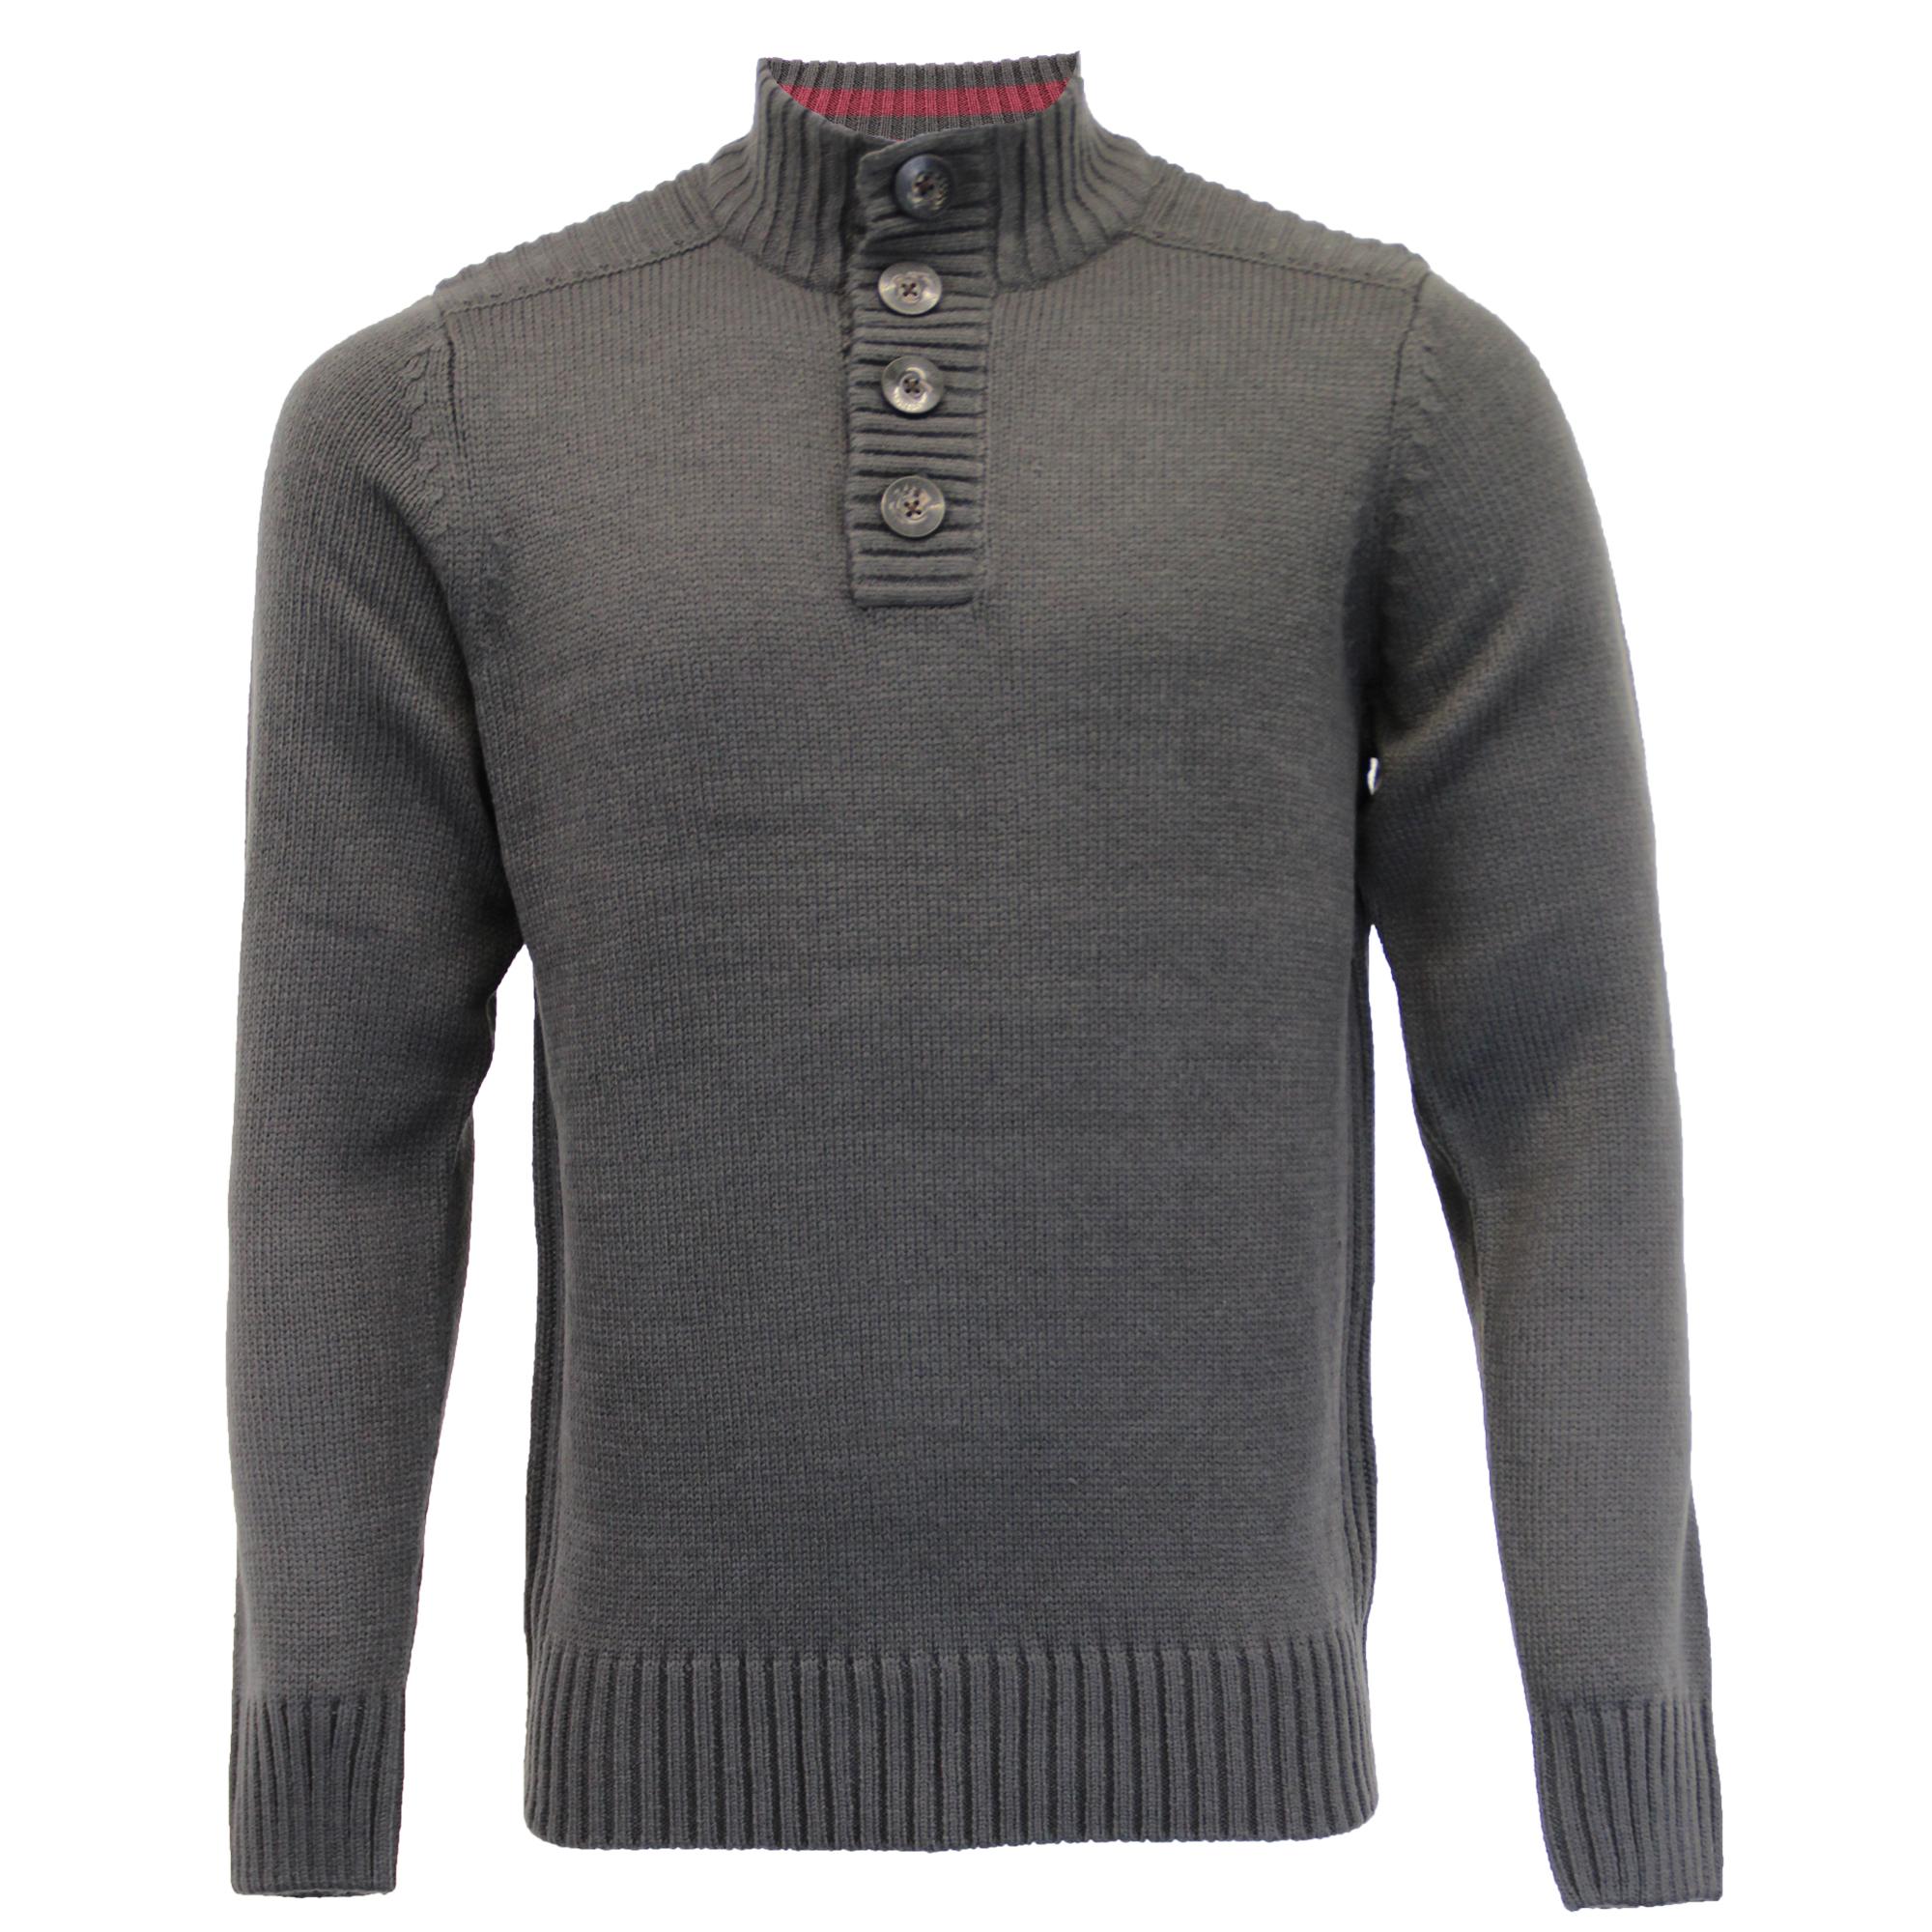 Mens-Knitted-Jumper-Kensington-Eastside-Sweater-Pullover-Top-Funnel-Neck-Winter thumbnail 4